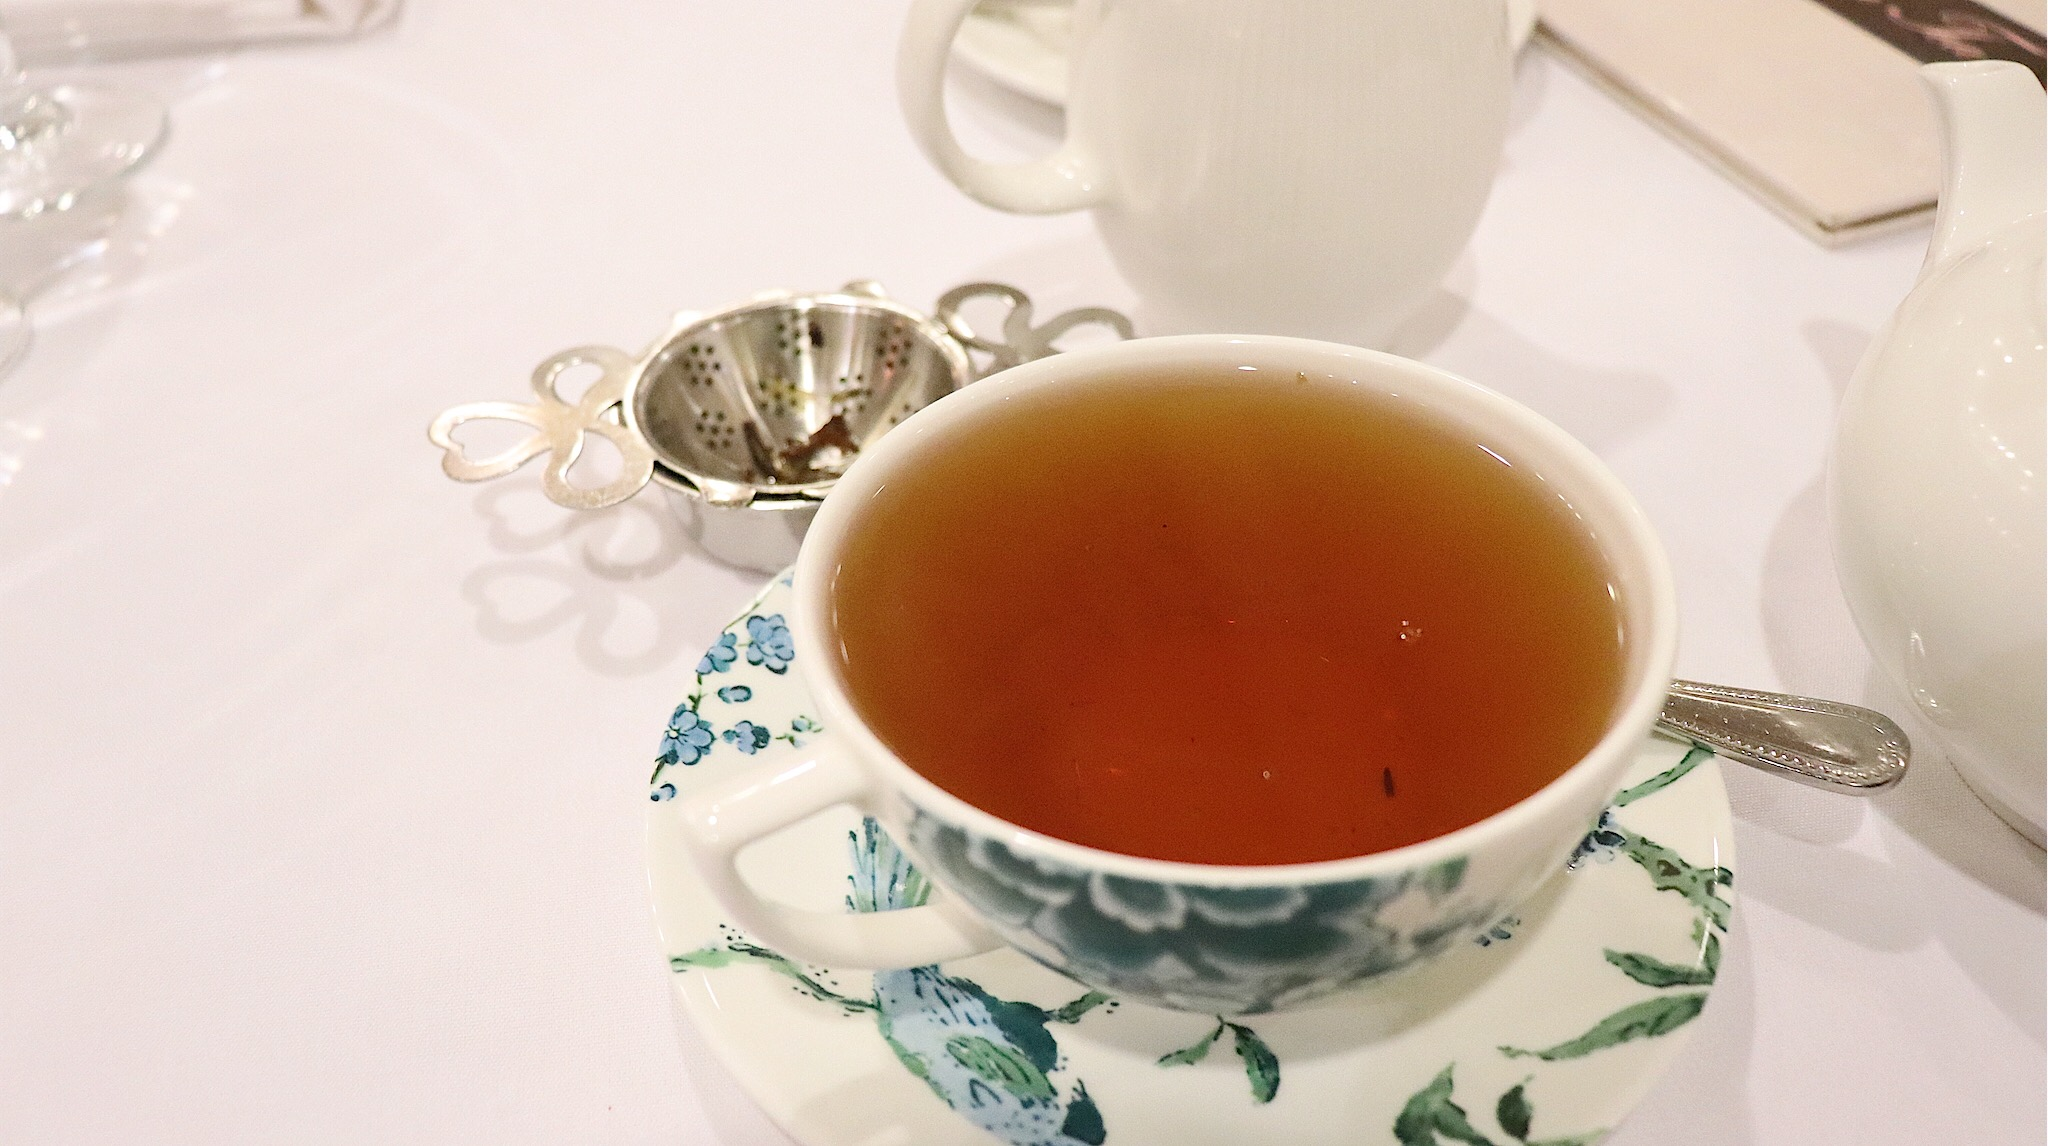 King Edward Blend (black tea)